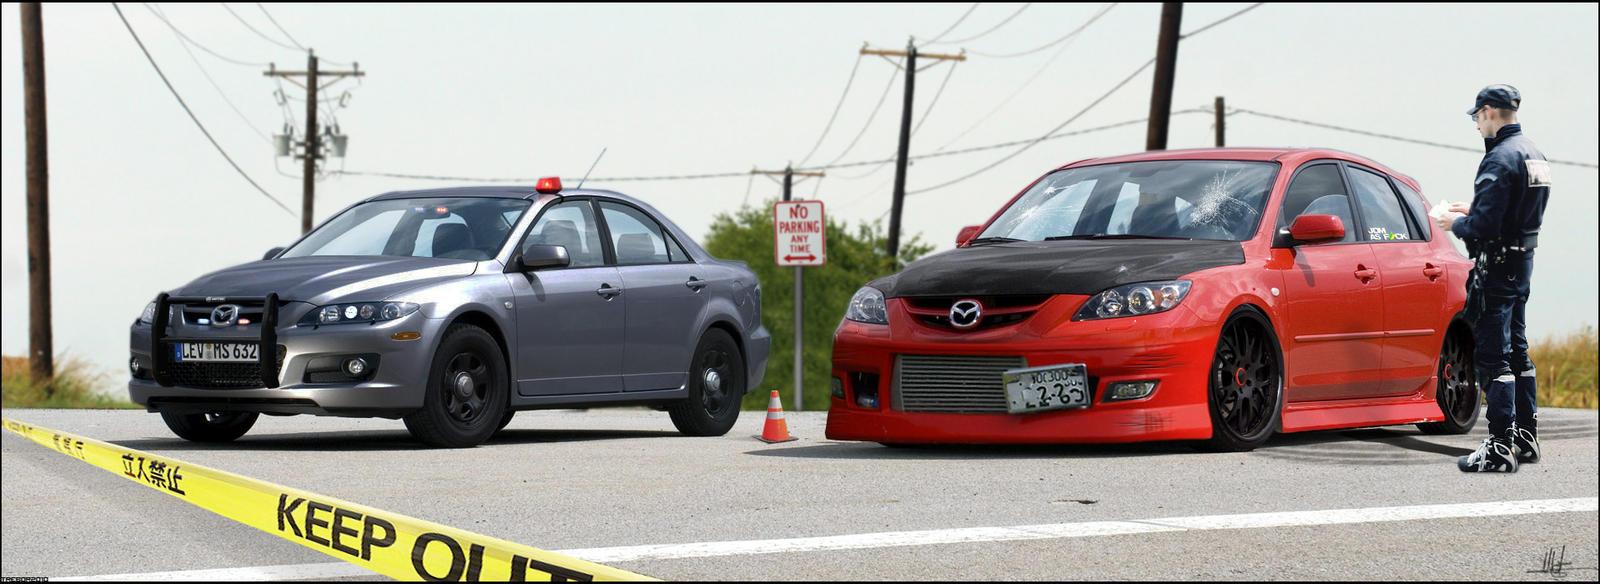 Mazda 6 MPS y Mazda 3 MPS